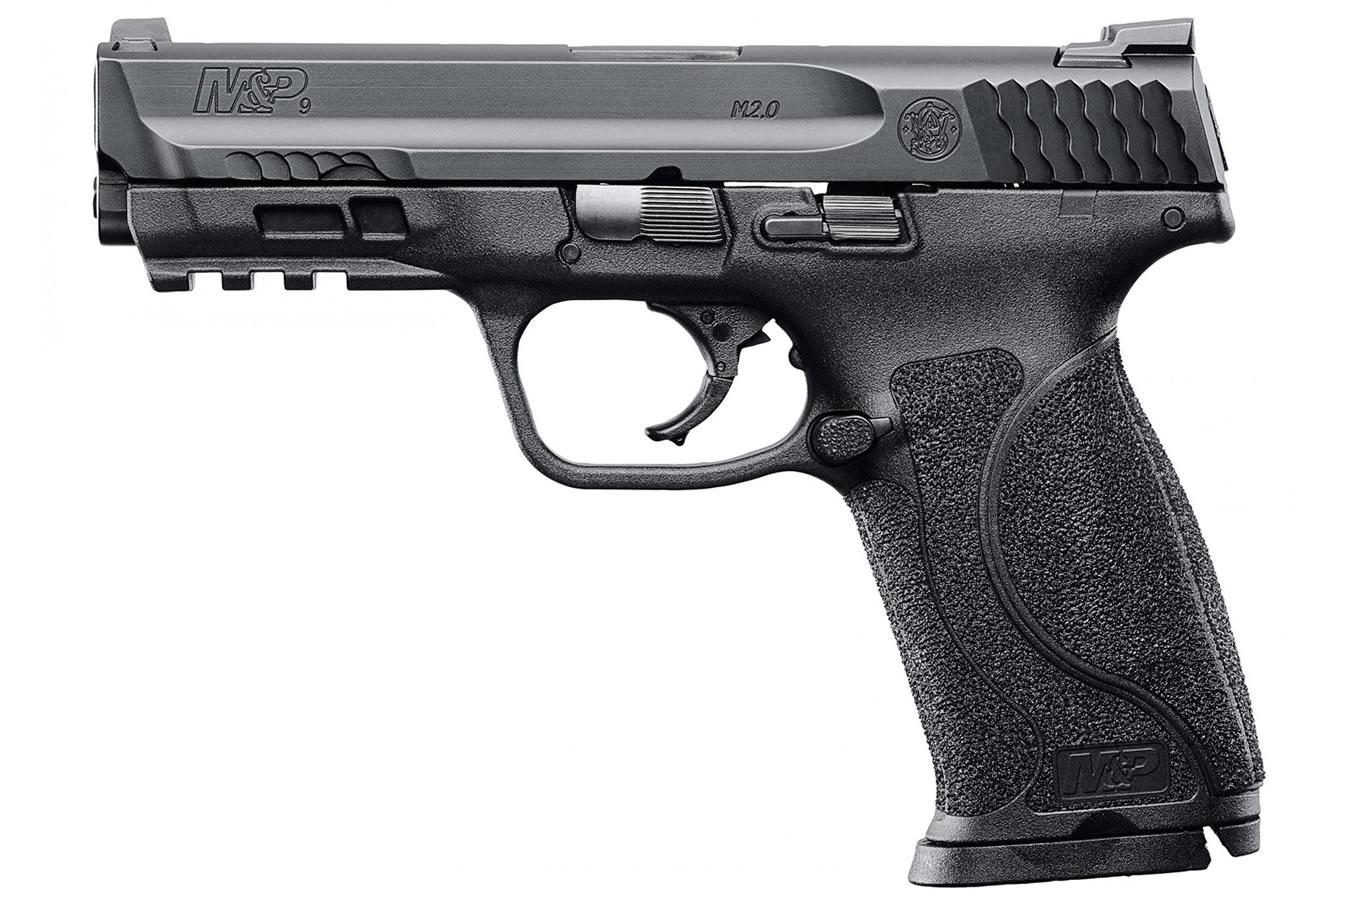 Smith & Wesson M&P M2.0 Pistol | GUNSweek.com